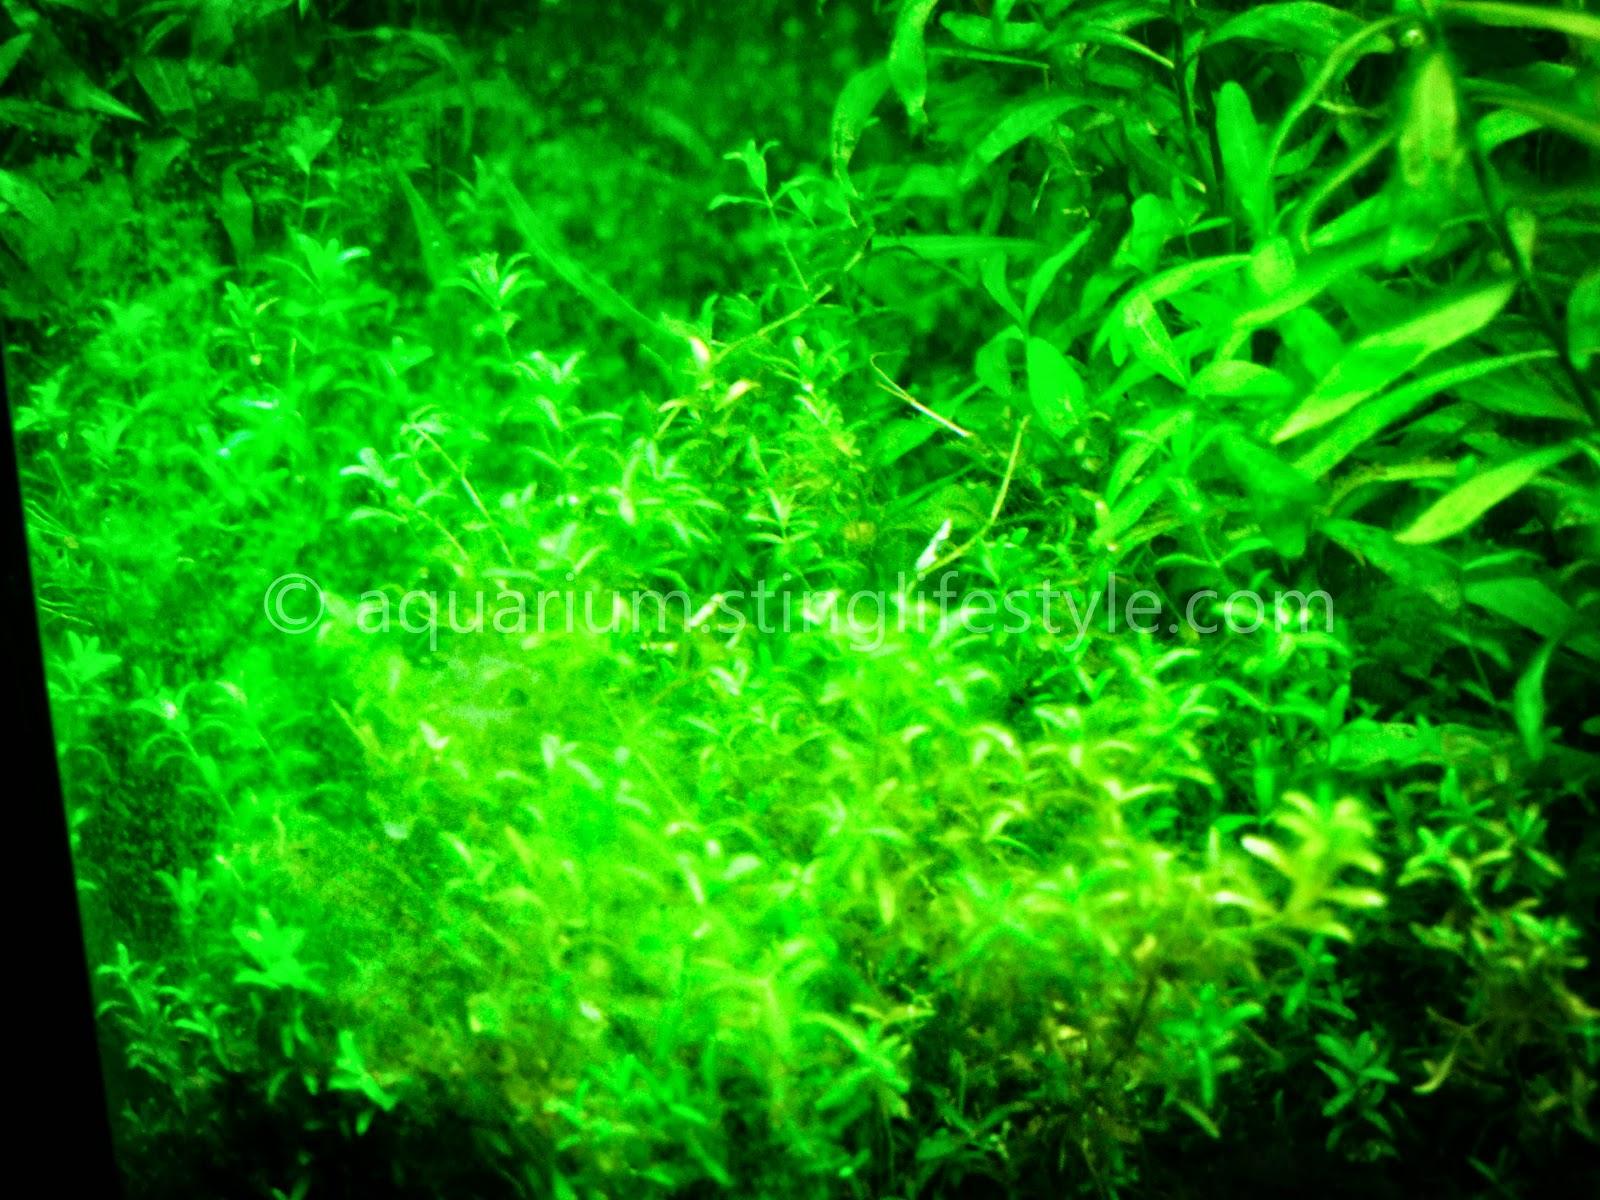 Aquarium Oh Green Black Hairstyle And Haircuts